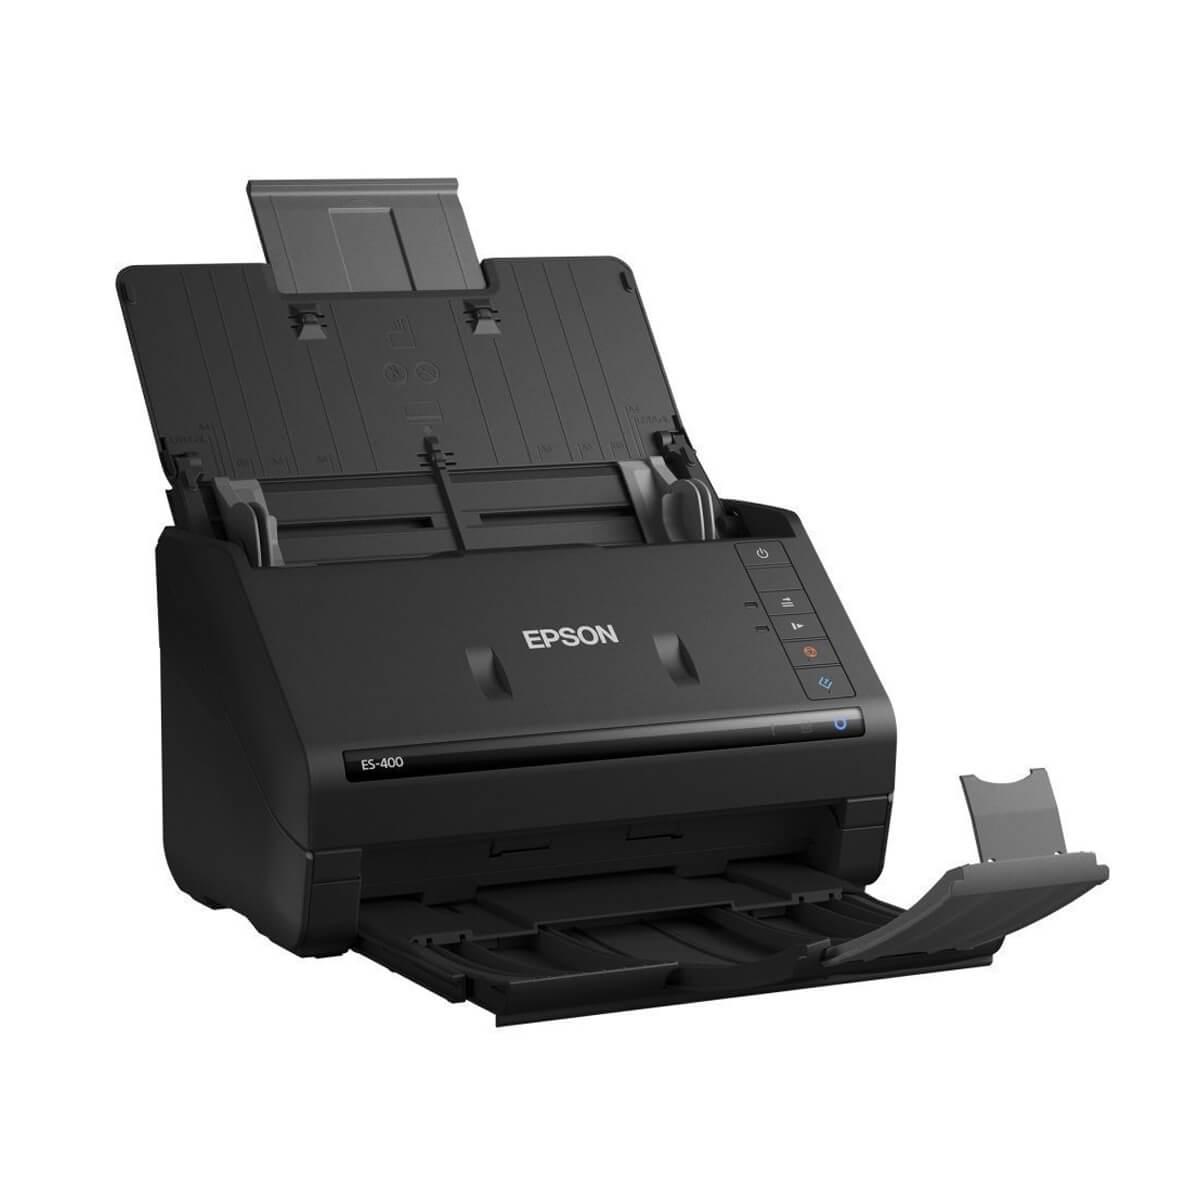 ES-400-03